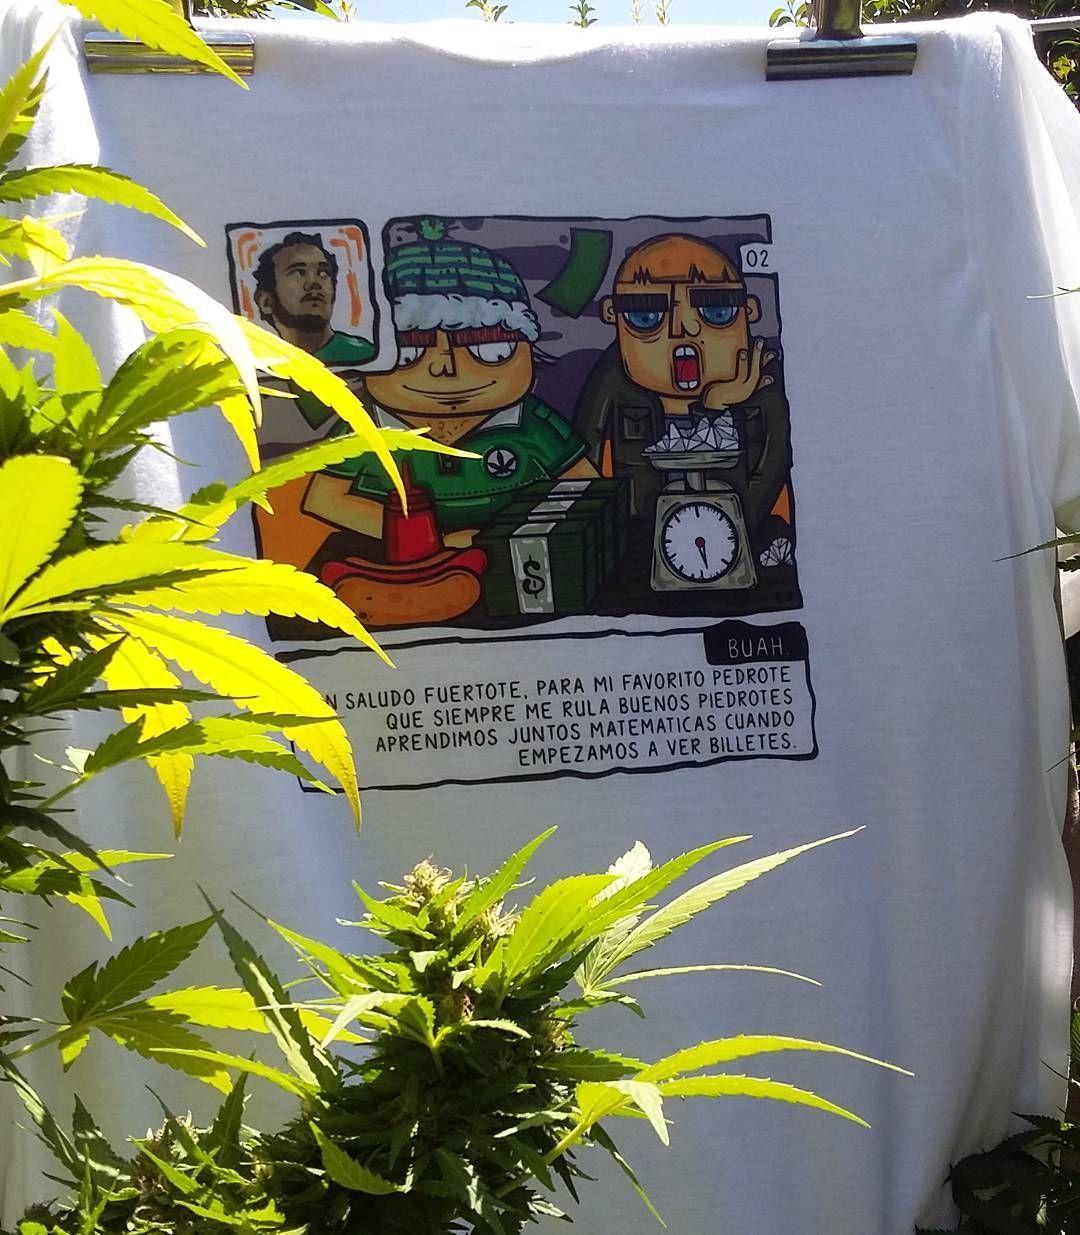 #7notas7colores #pedrote #rapespañol @creambarbershop  #buah #weed #420 #marihuana #rap #hiphop #rap #tshirt #sativa #ilustradorchileno #ilustración #illustration #ilustracion #draw #drawing #drawings #art #artist #hotdog #colorist #painting #paint #artoftheday #conceptart #dinero #cash #cashmeoutsidehowboutdat